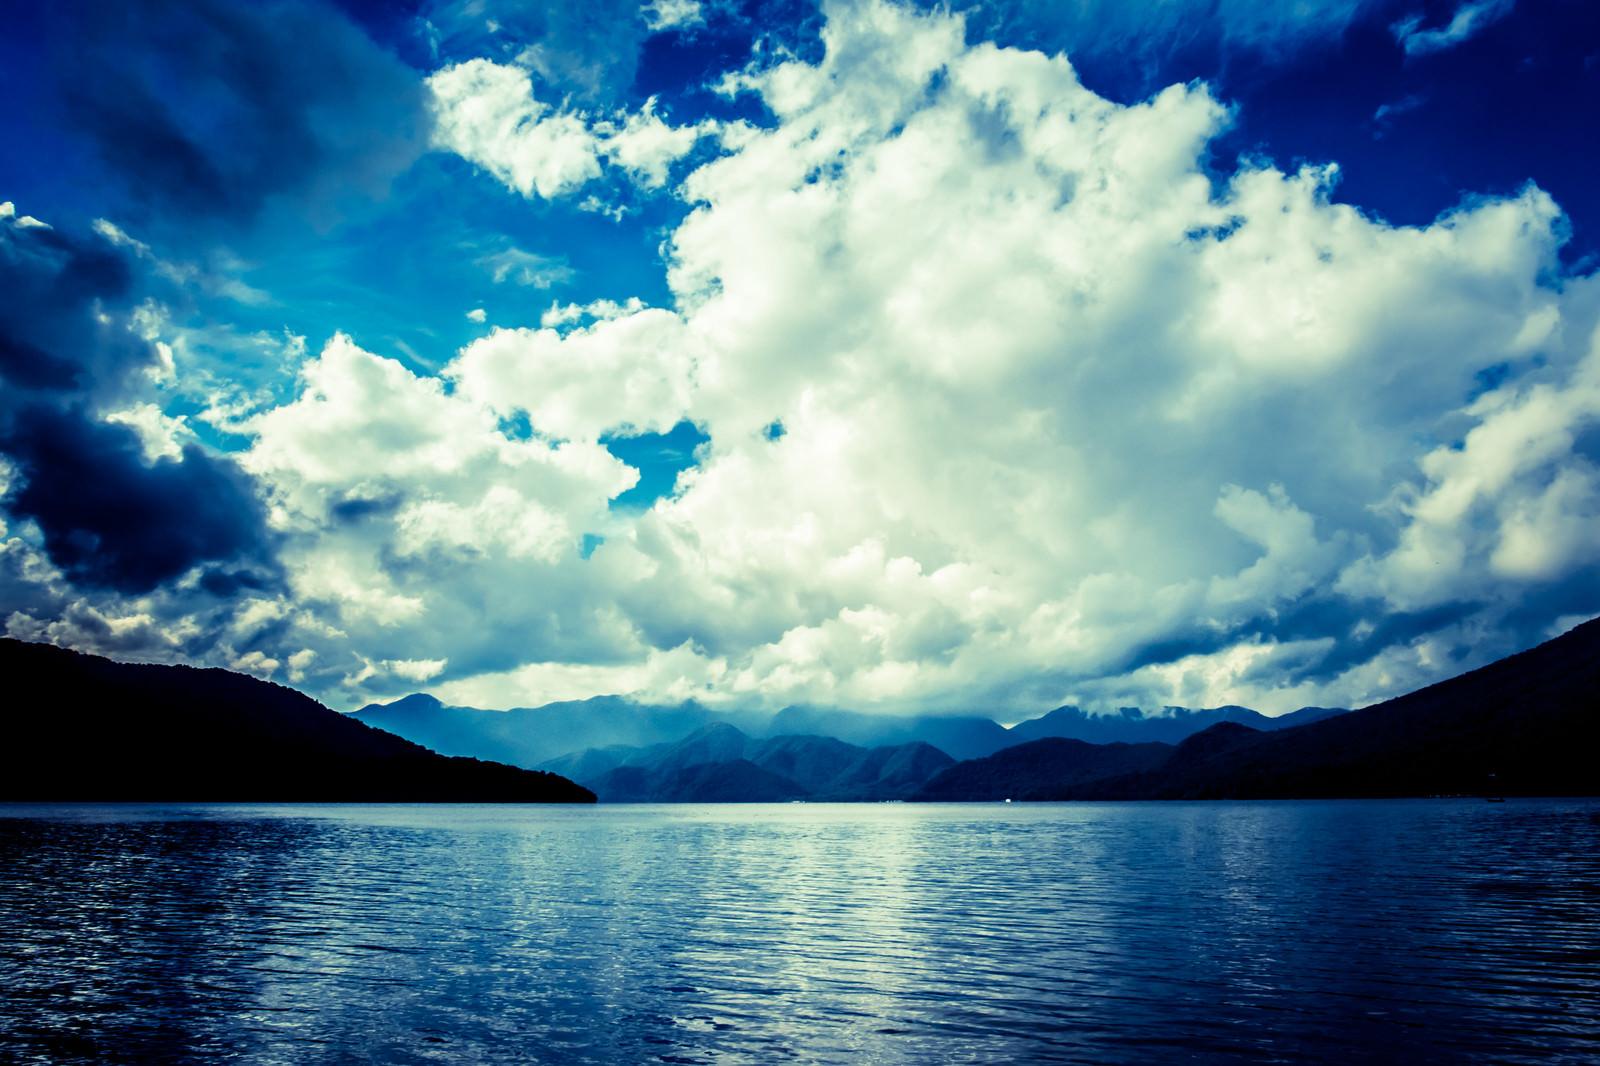 「中禅寺湖」の写真